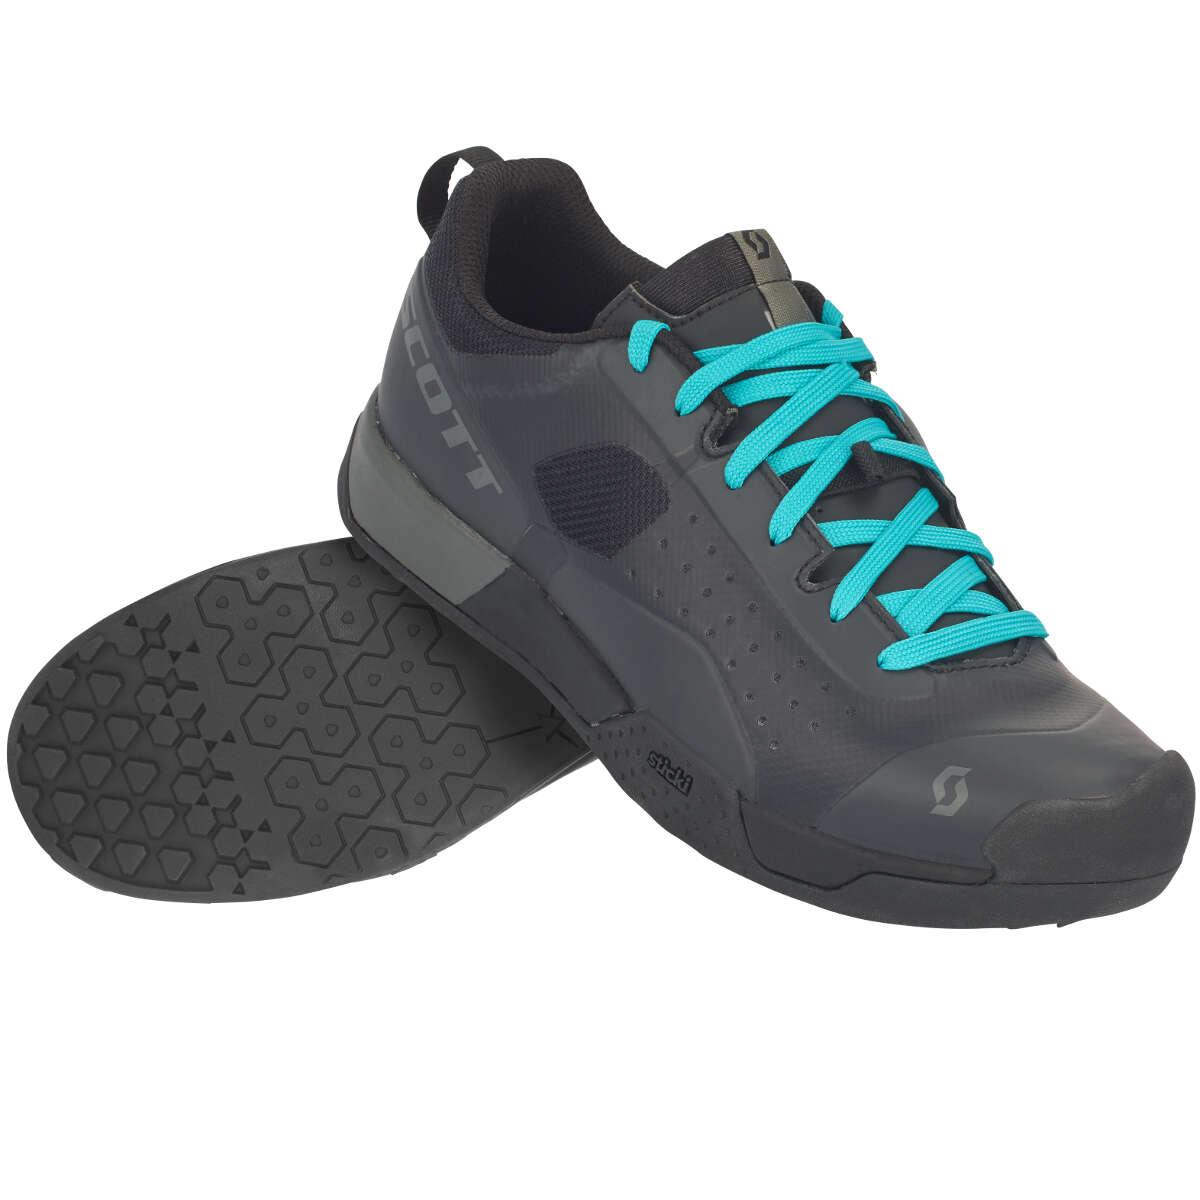 Scott Lace Girls MTB-Schuhe MTB AR Lace Scott Schwarz/Grau 01e1a4